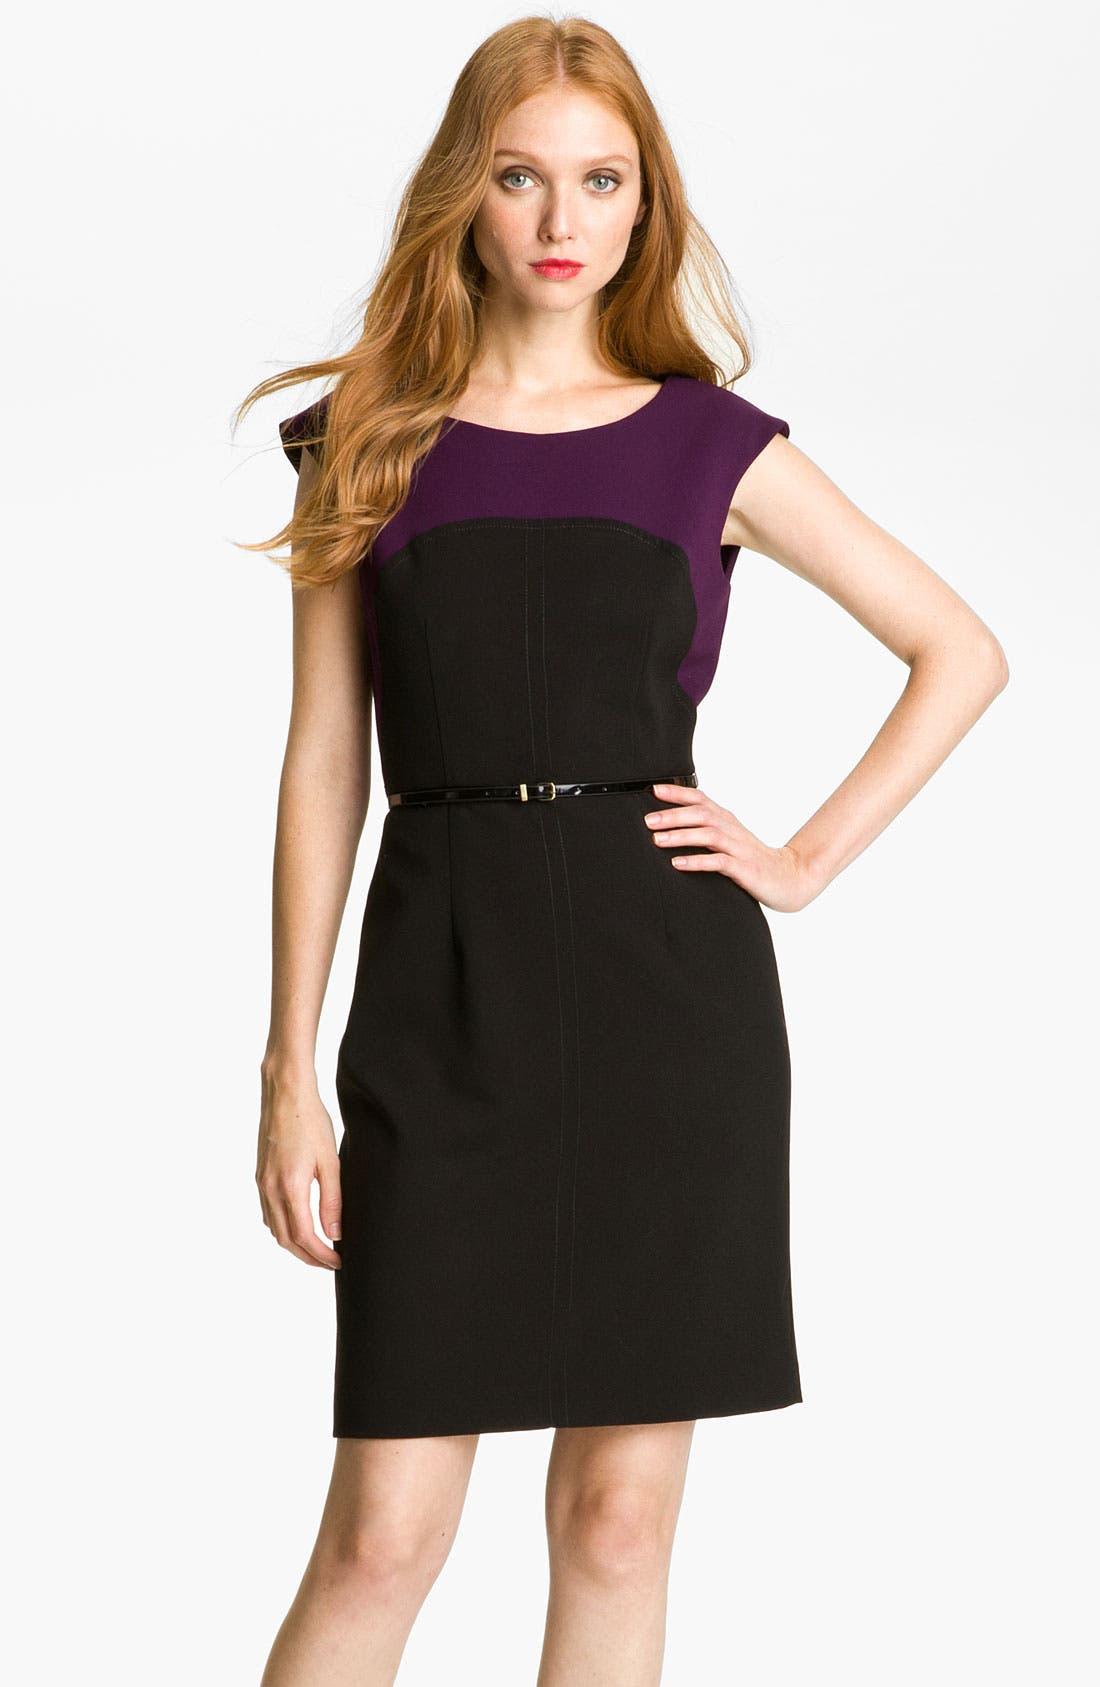 Alternate Image 1 Selected - Calvin Klein Colorblock Belted Sheath Dress (Petite)